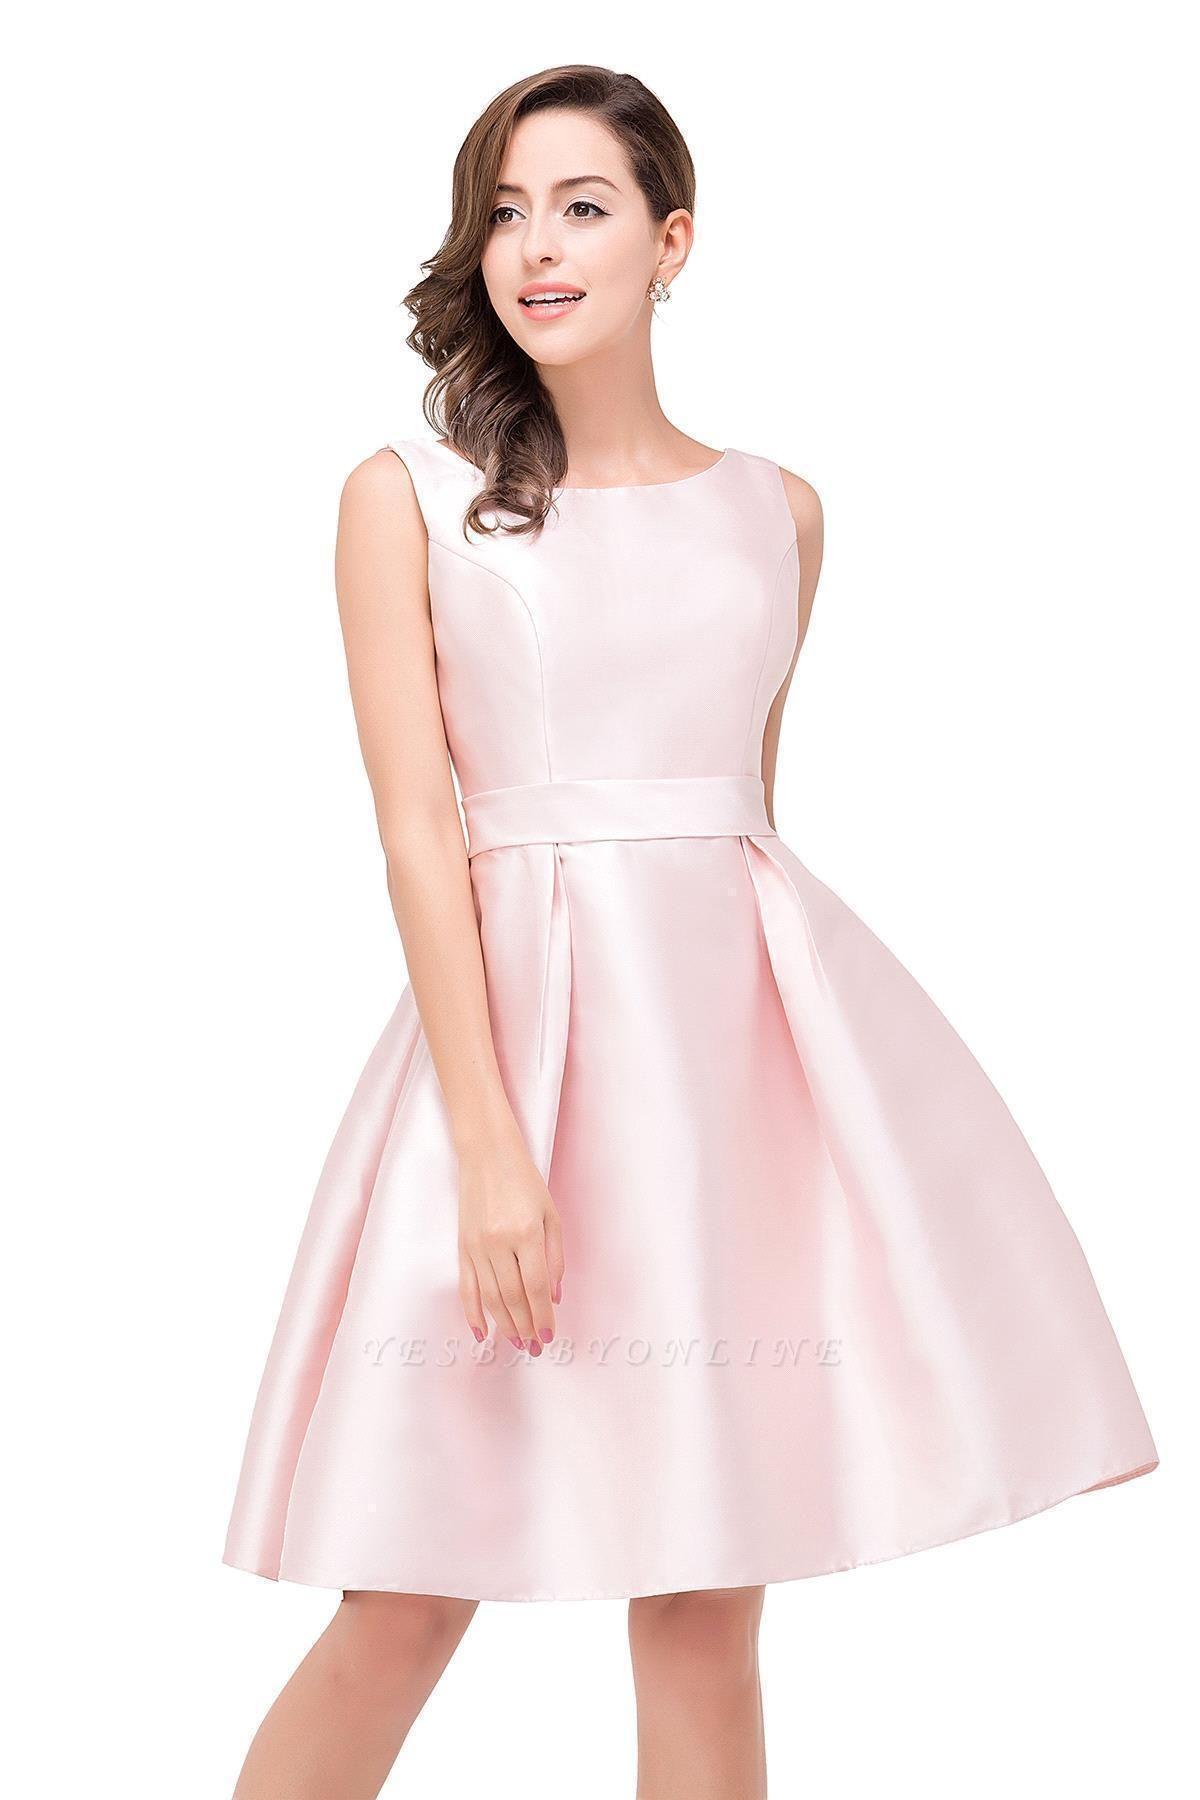 Sleeveless Short A-Line Knee Length Prom Dress